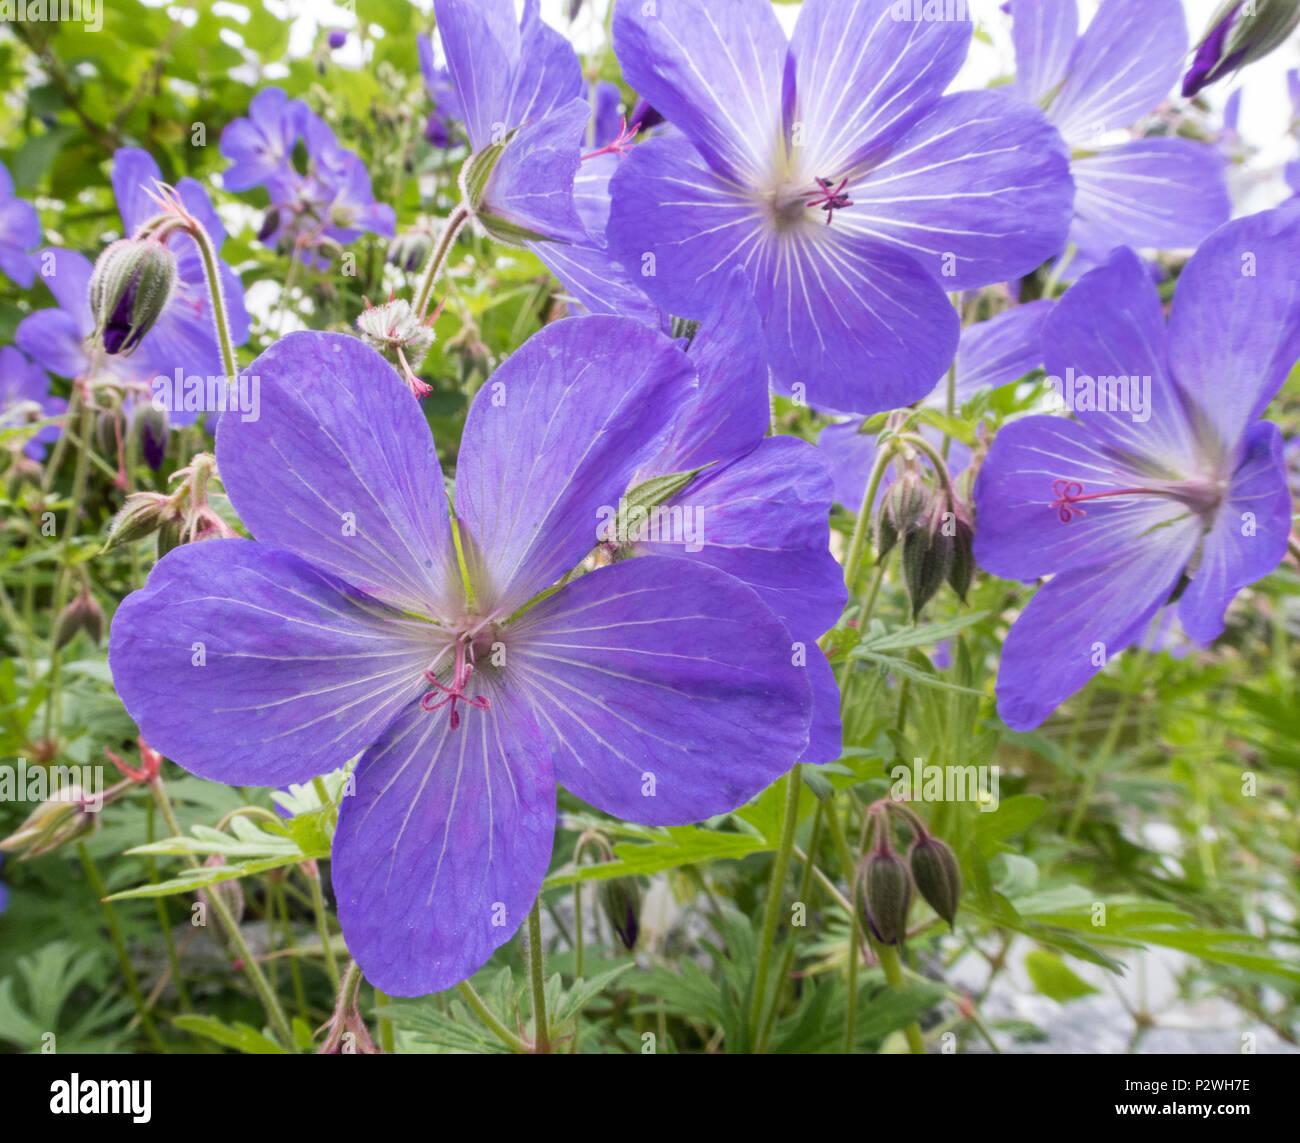 Geranium Johnson's Blue, cranesbill, flowering geranium, × johnsonii - Stock Image